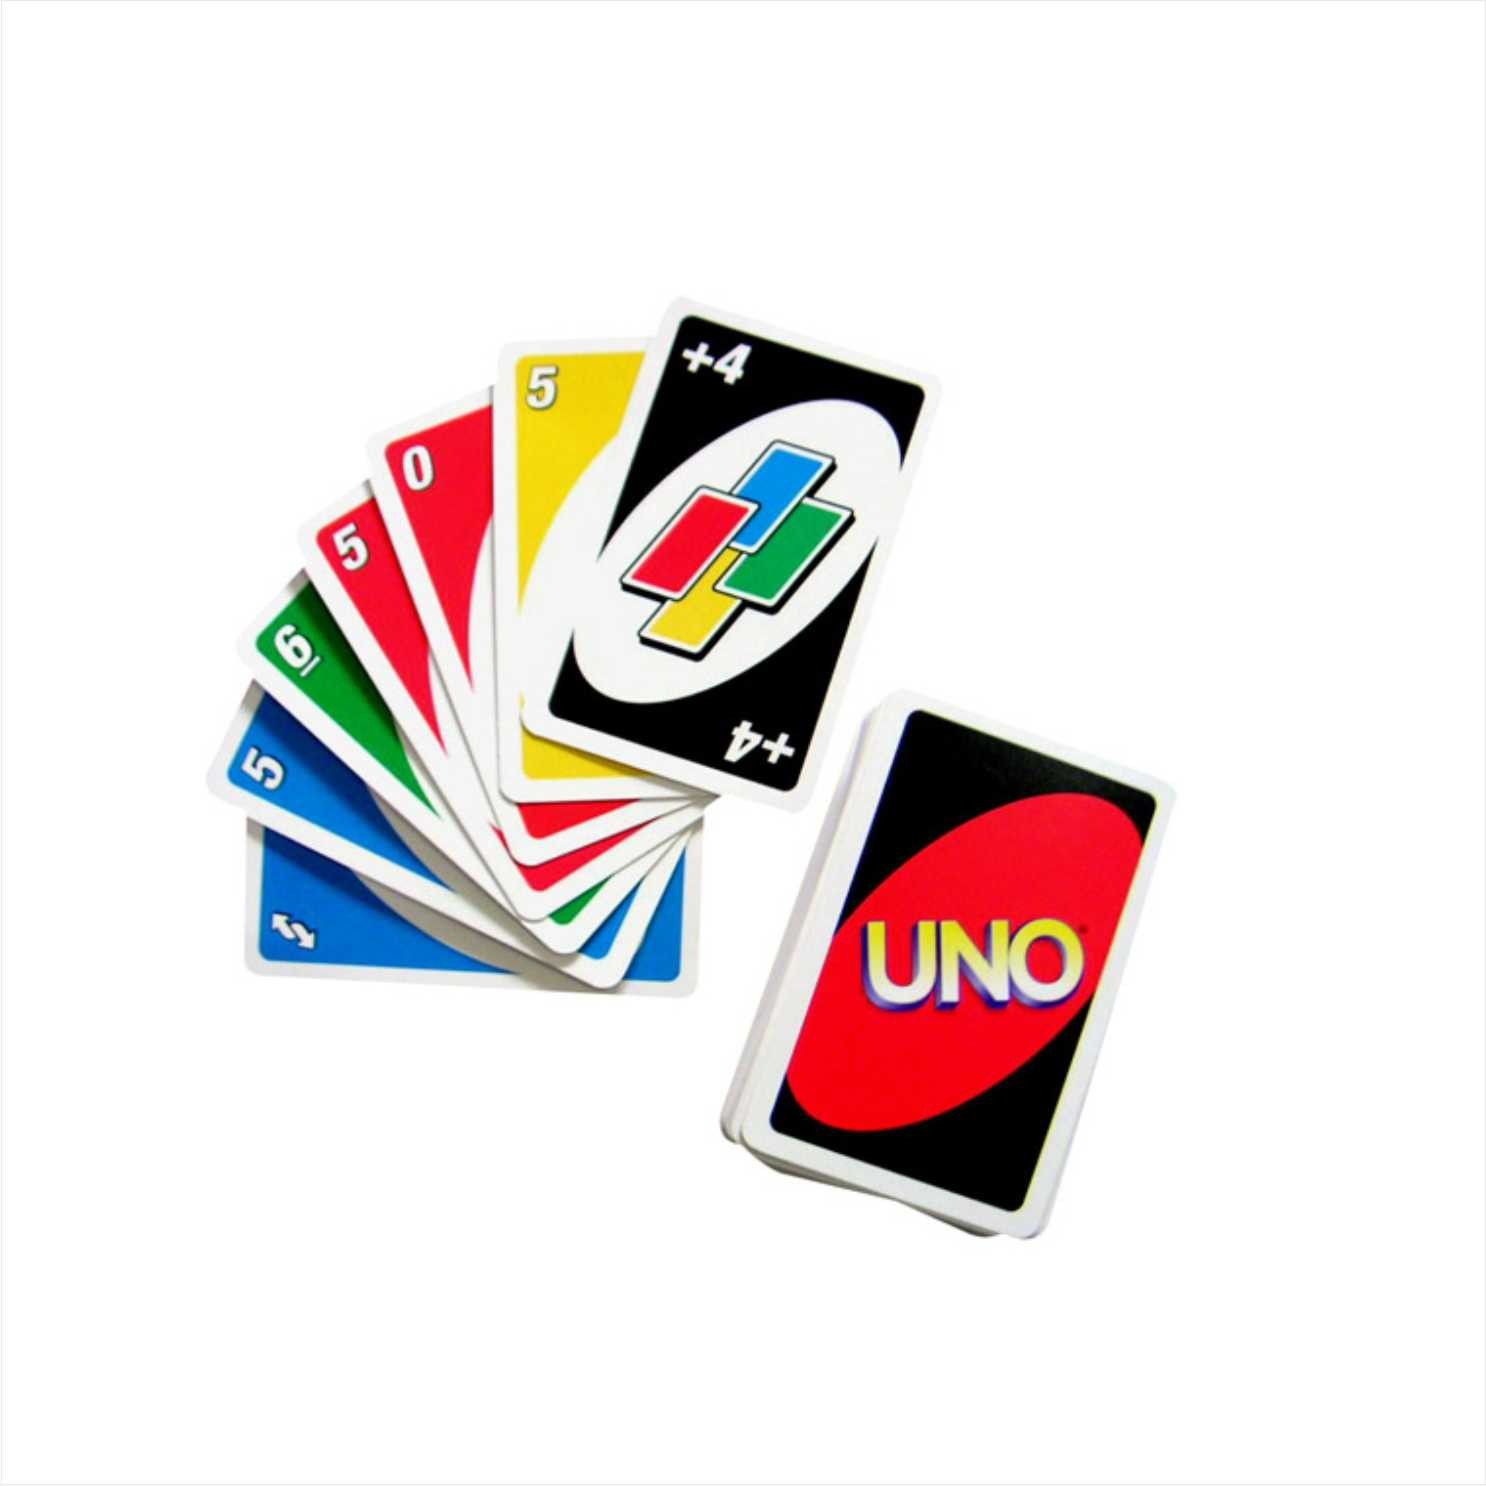 Jogo de Cartas - Uno - Copag - Couché  - Loja do Competidor